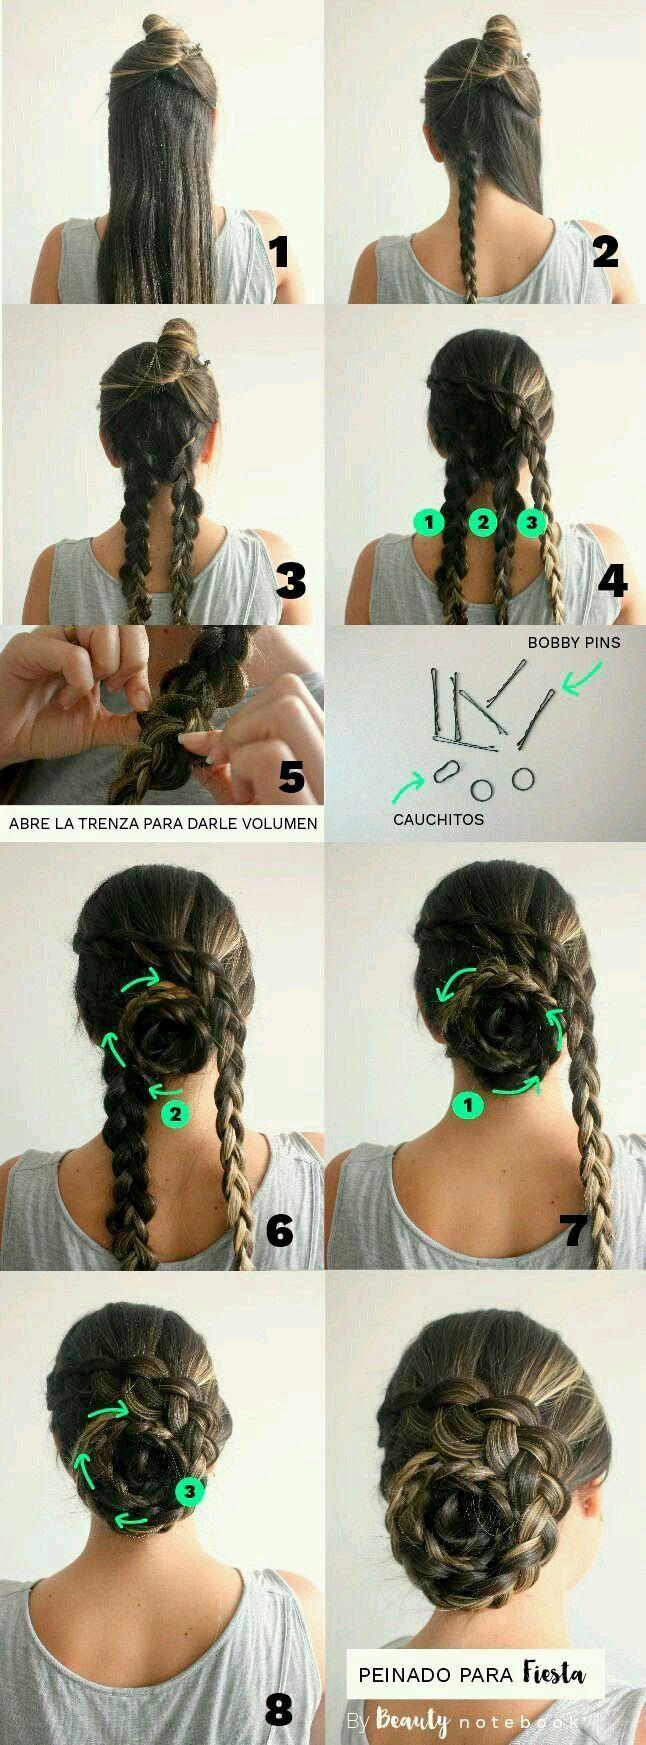 lange Haare Modelle – Frisuren  #frisuren #haare #lange #modelle Frisur ideen